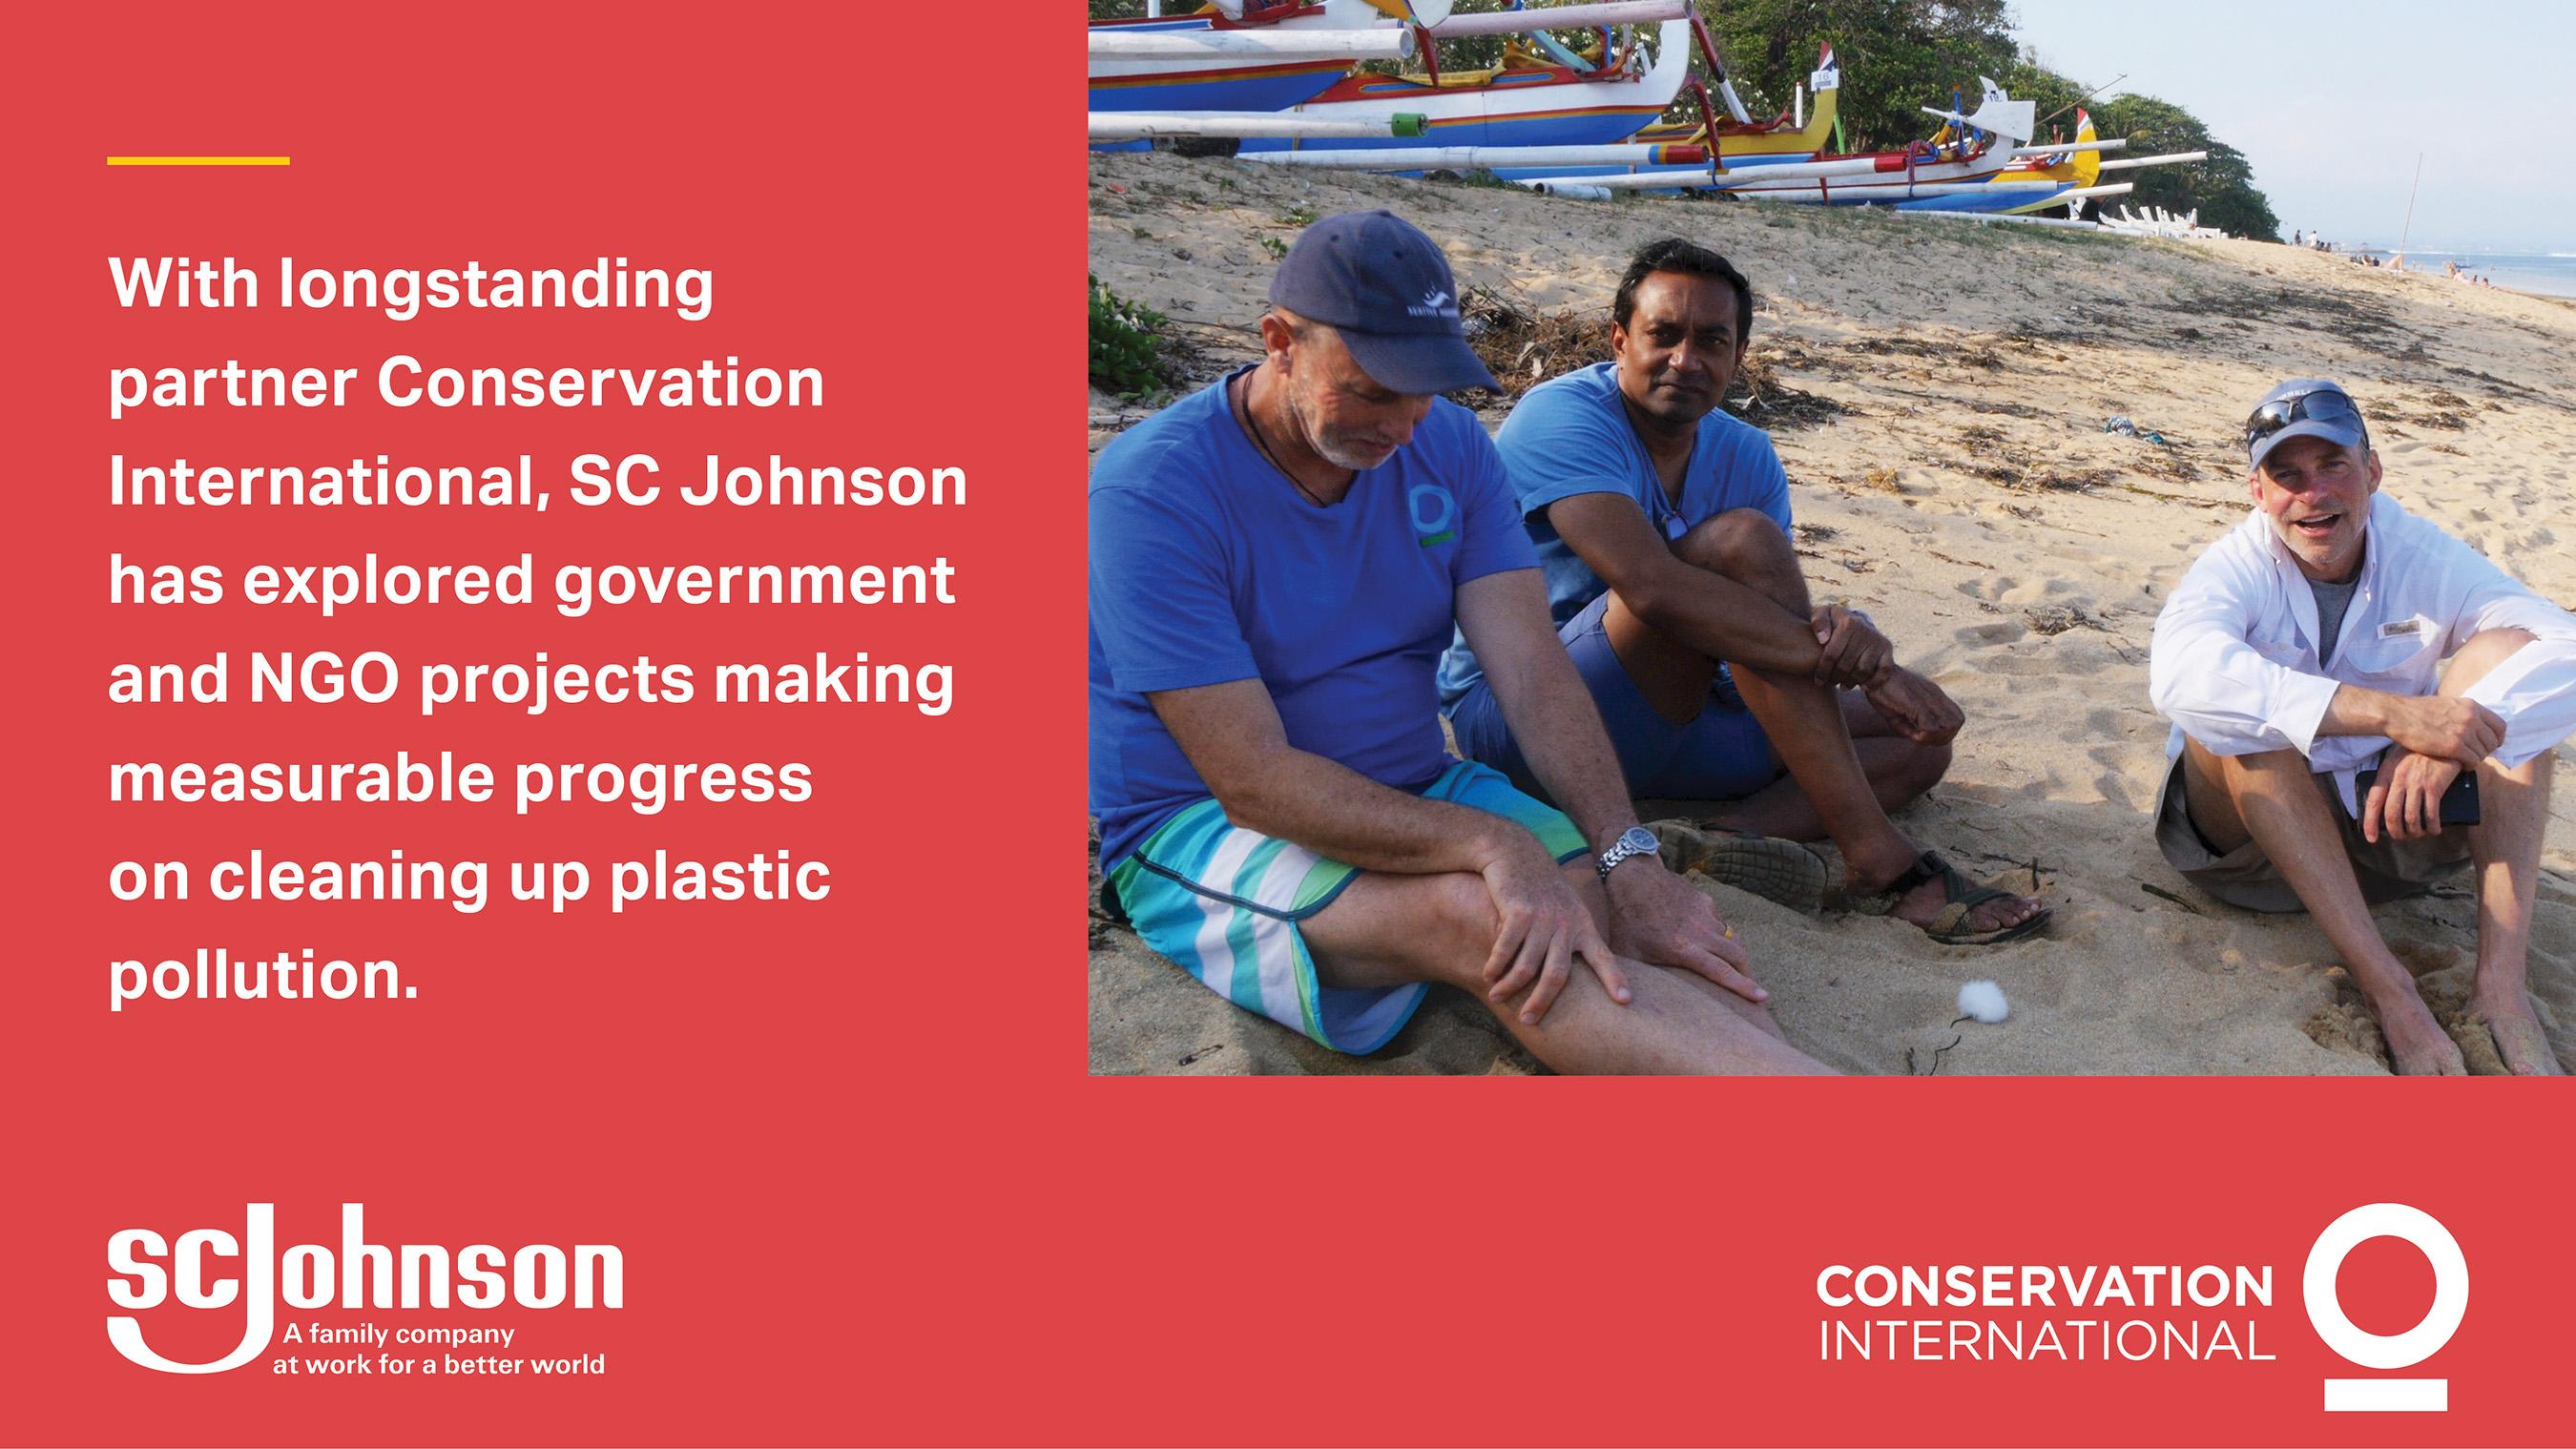 Mark Erdmann, VP Conservation International, M. Sanjayan, CEO of Conservation International and Fisk Johnson, Chairman and CEO of SC Johnson discuss ocean health.